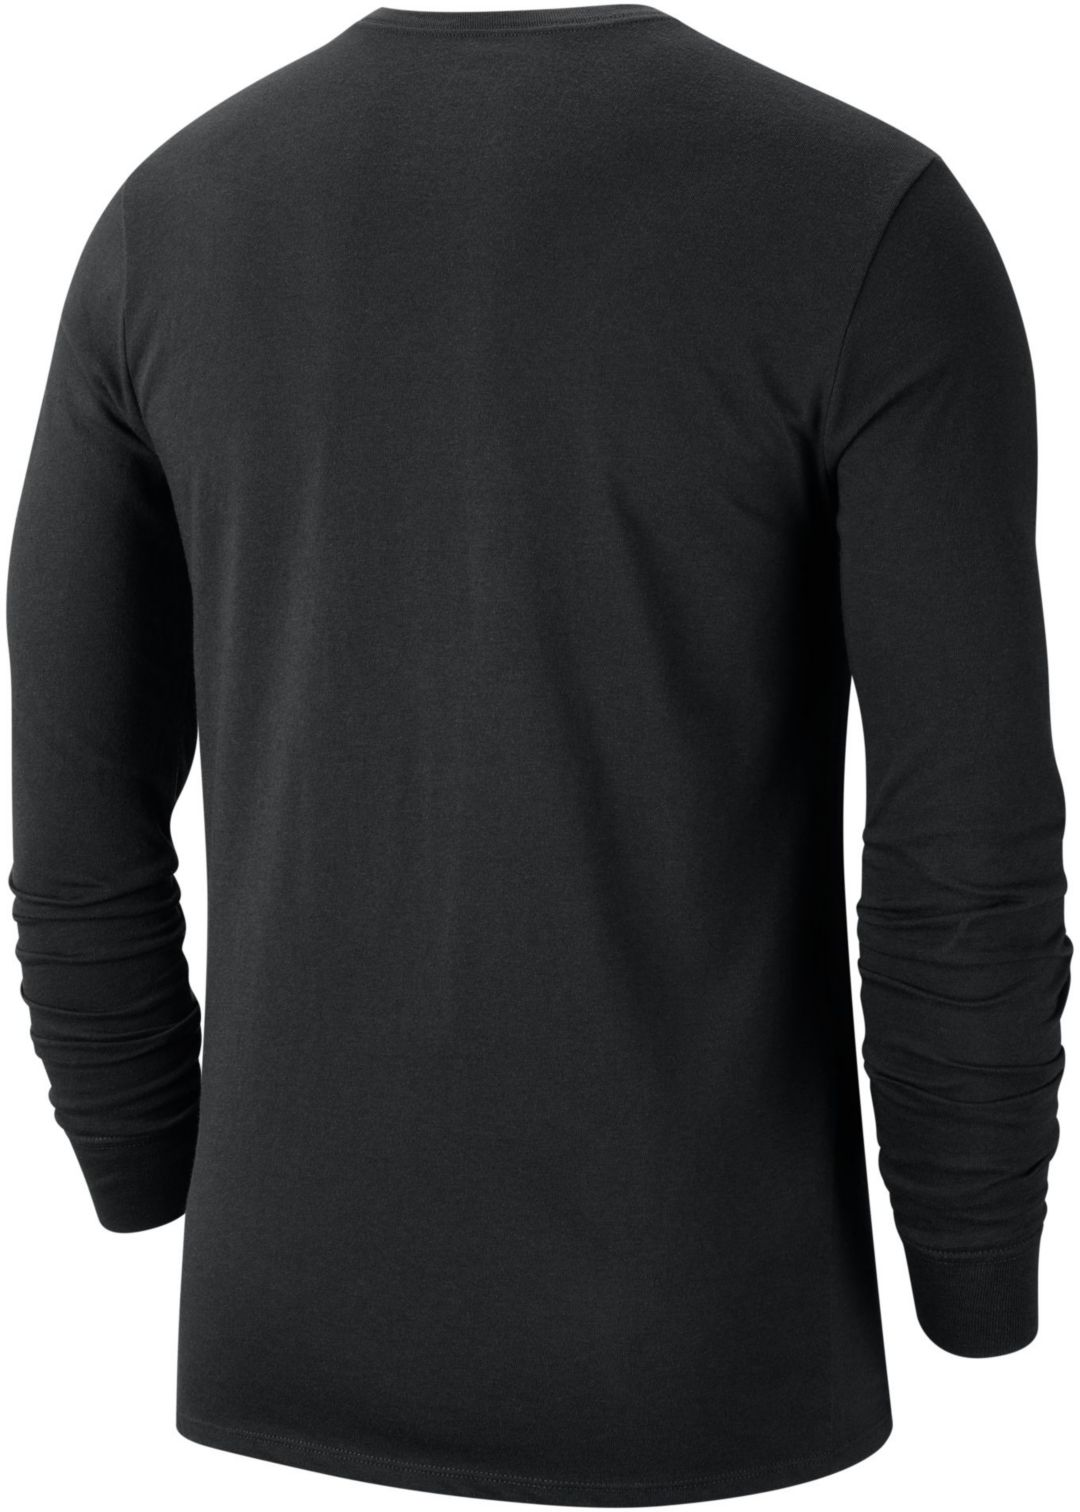 a065cc11 Nike Men's Colorado Rockies Dri-FIT Long Sleeve Shirt | DICK'S ...